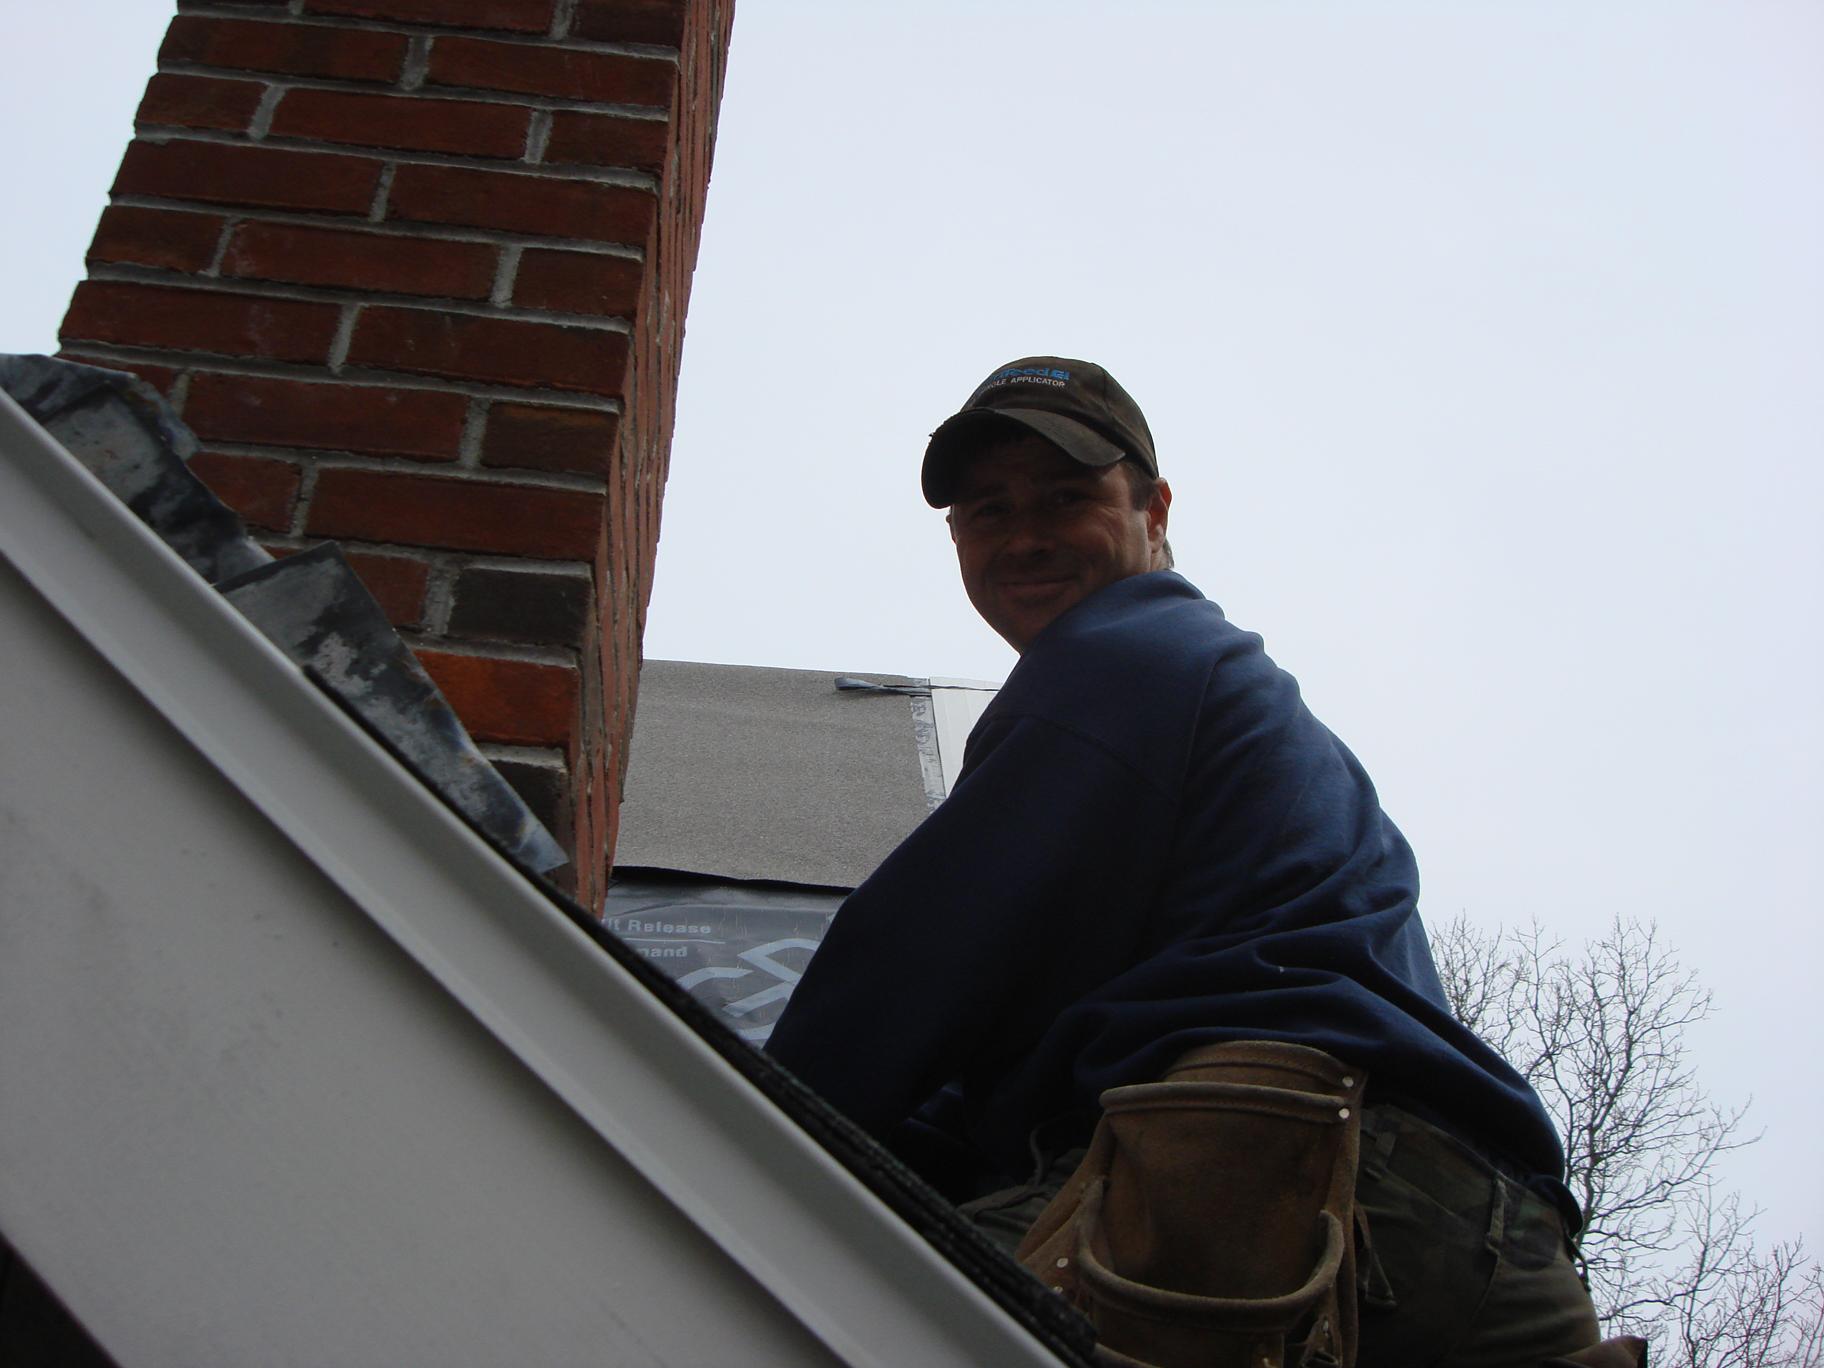 Roofing Business Start Up Kit Blog